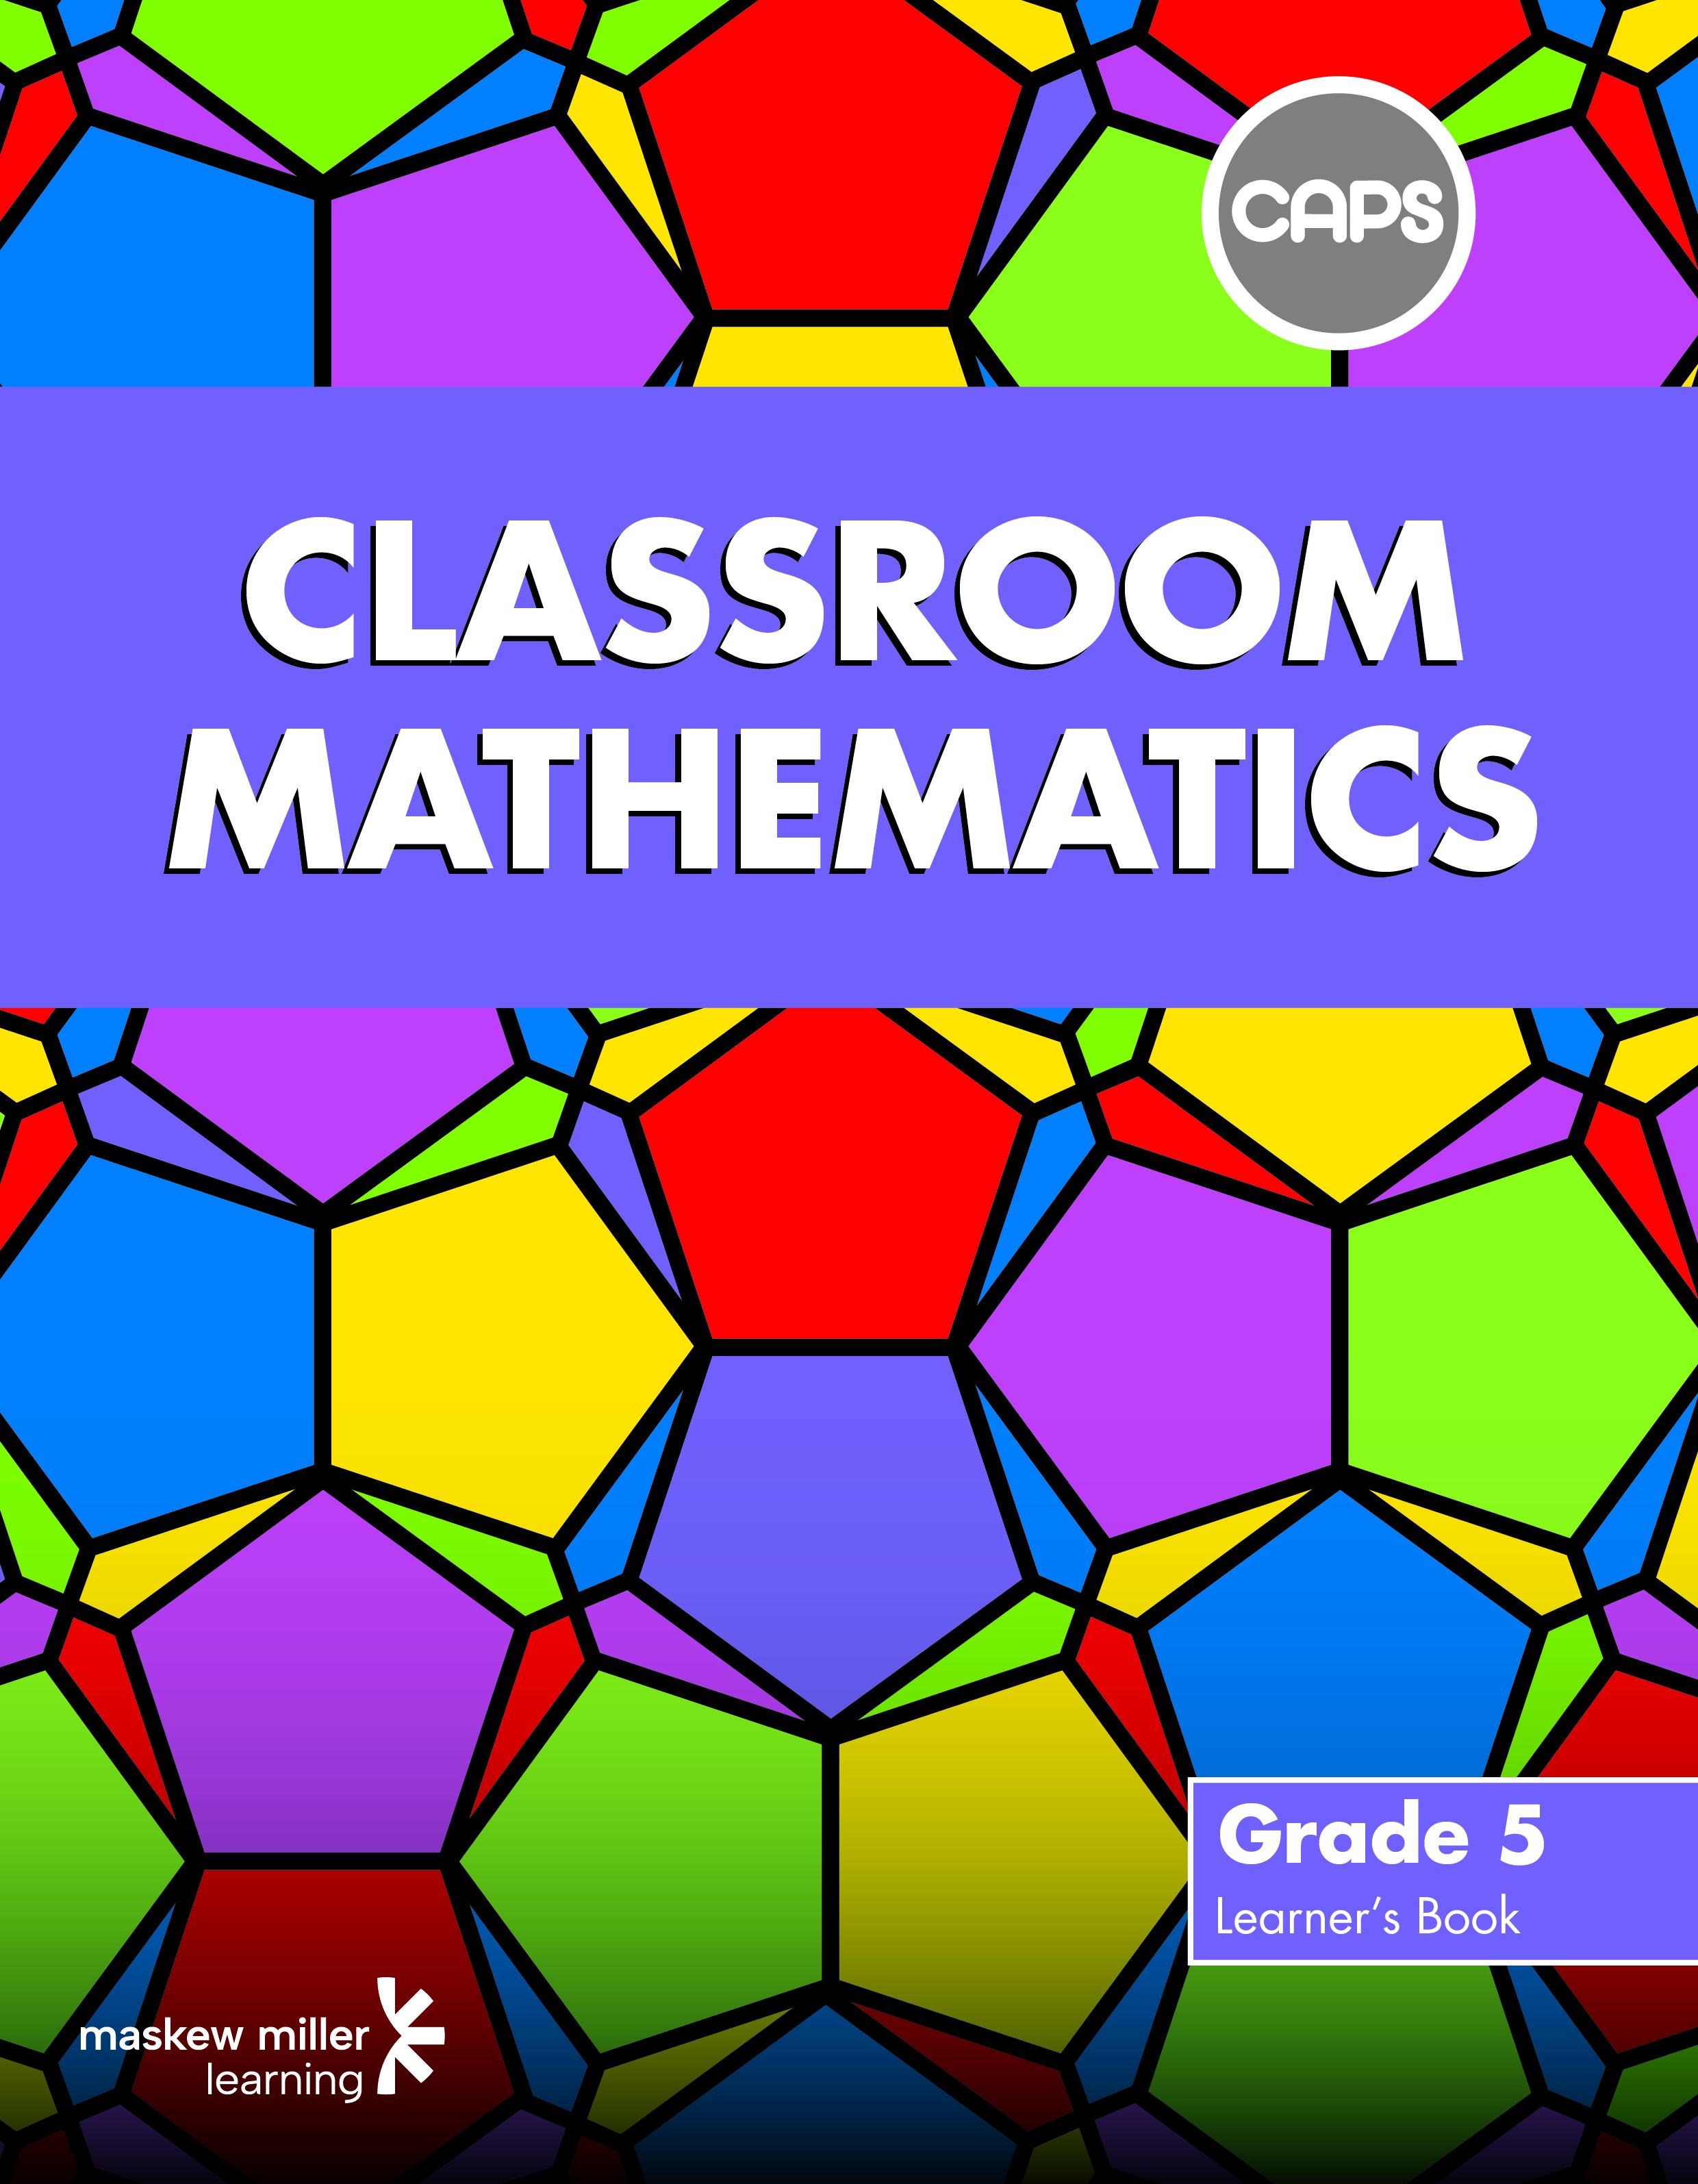 Picture of Classroom mathematics CAPS